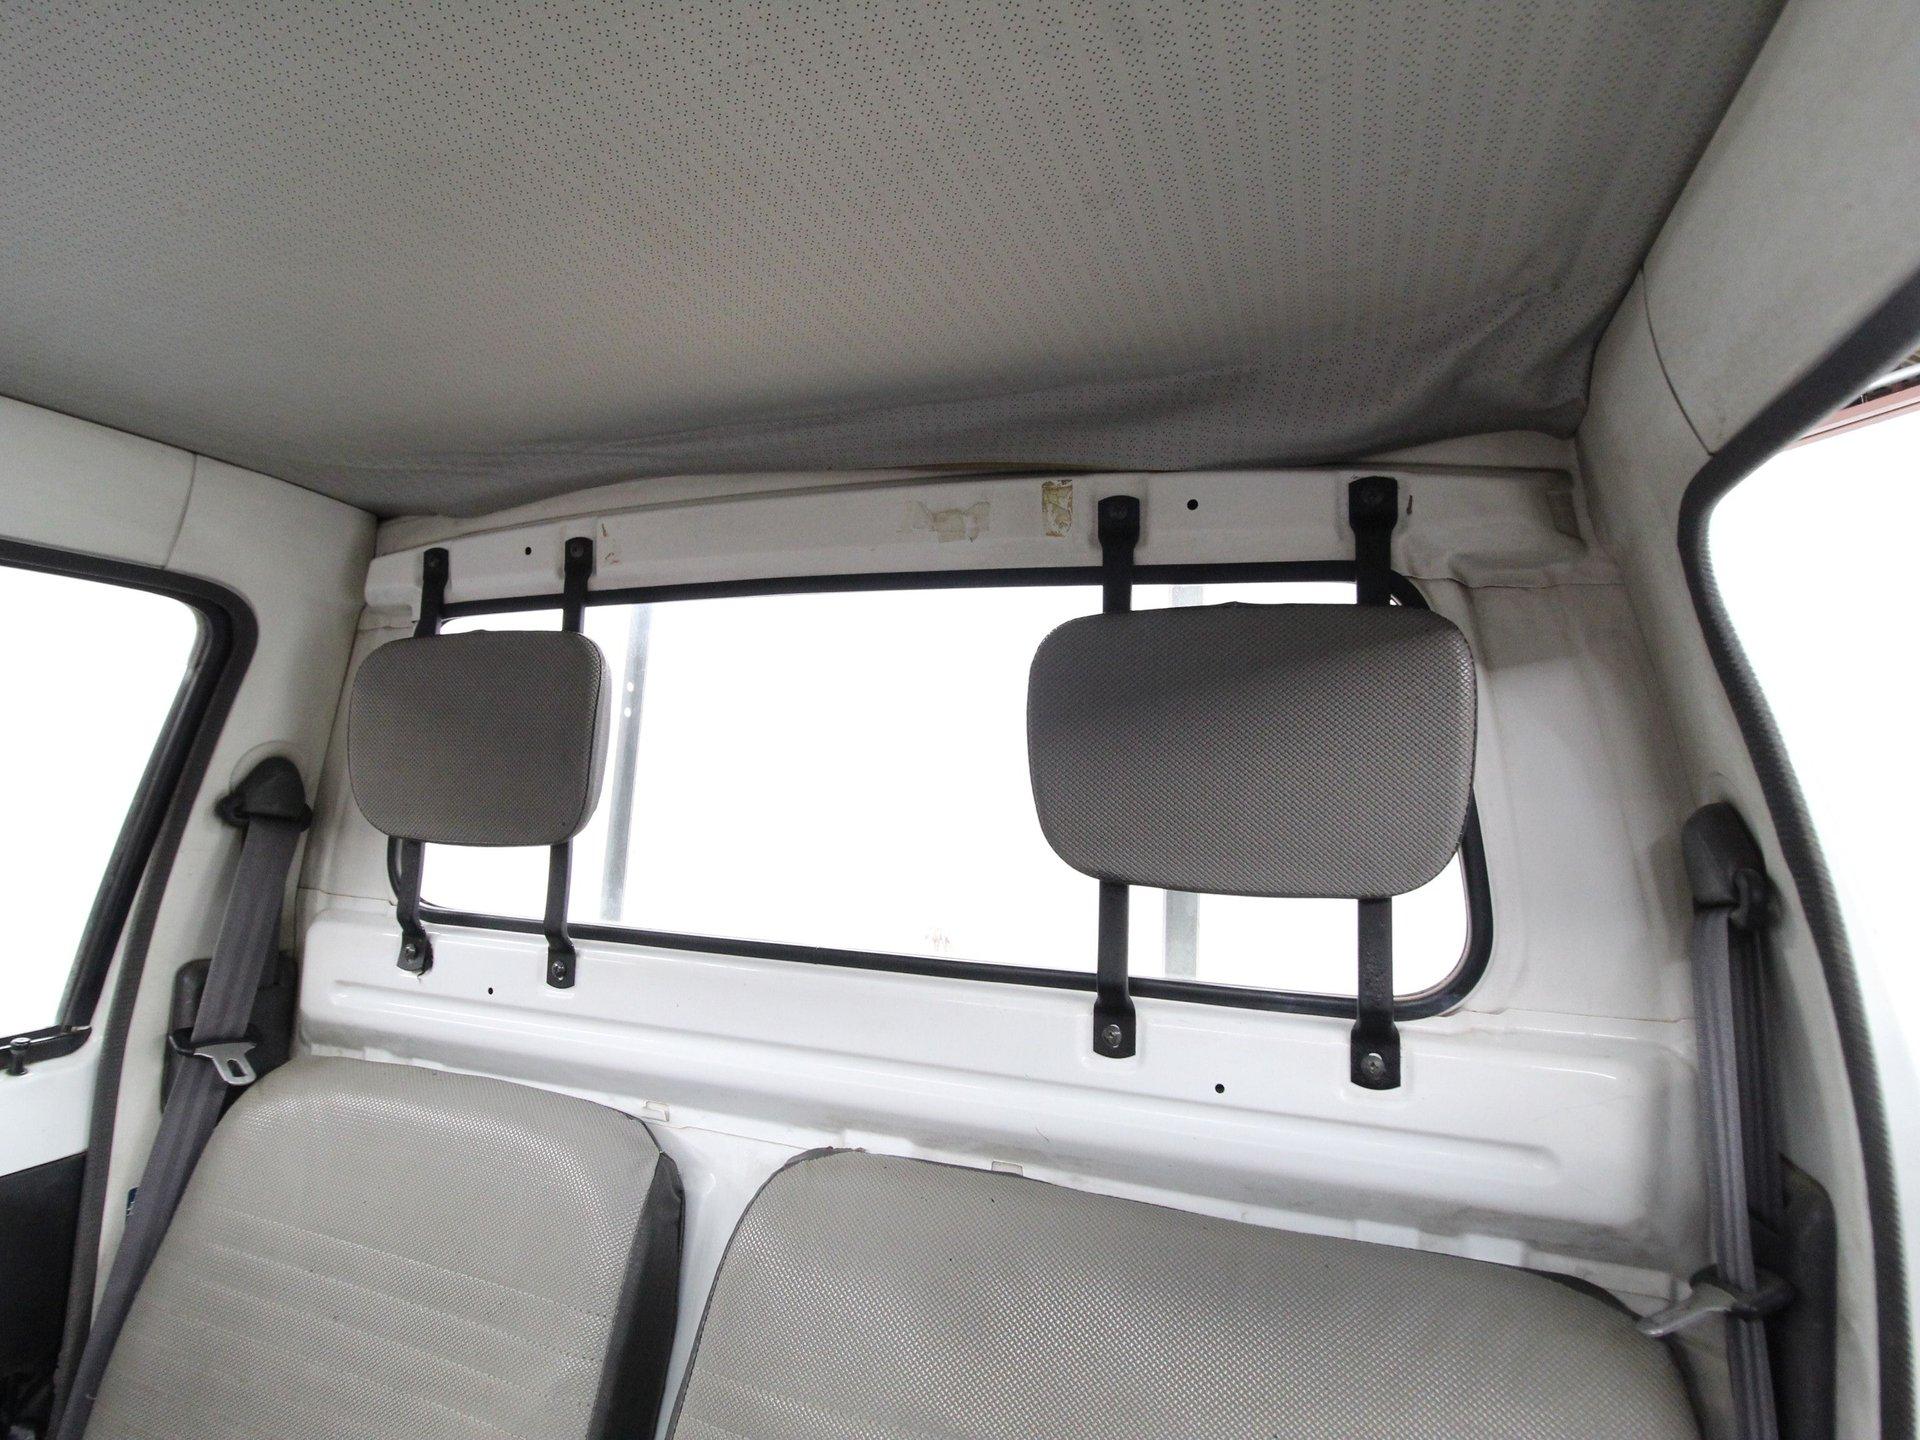 1994 Suzuki Carry